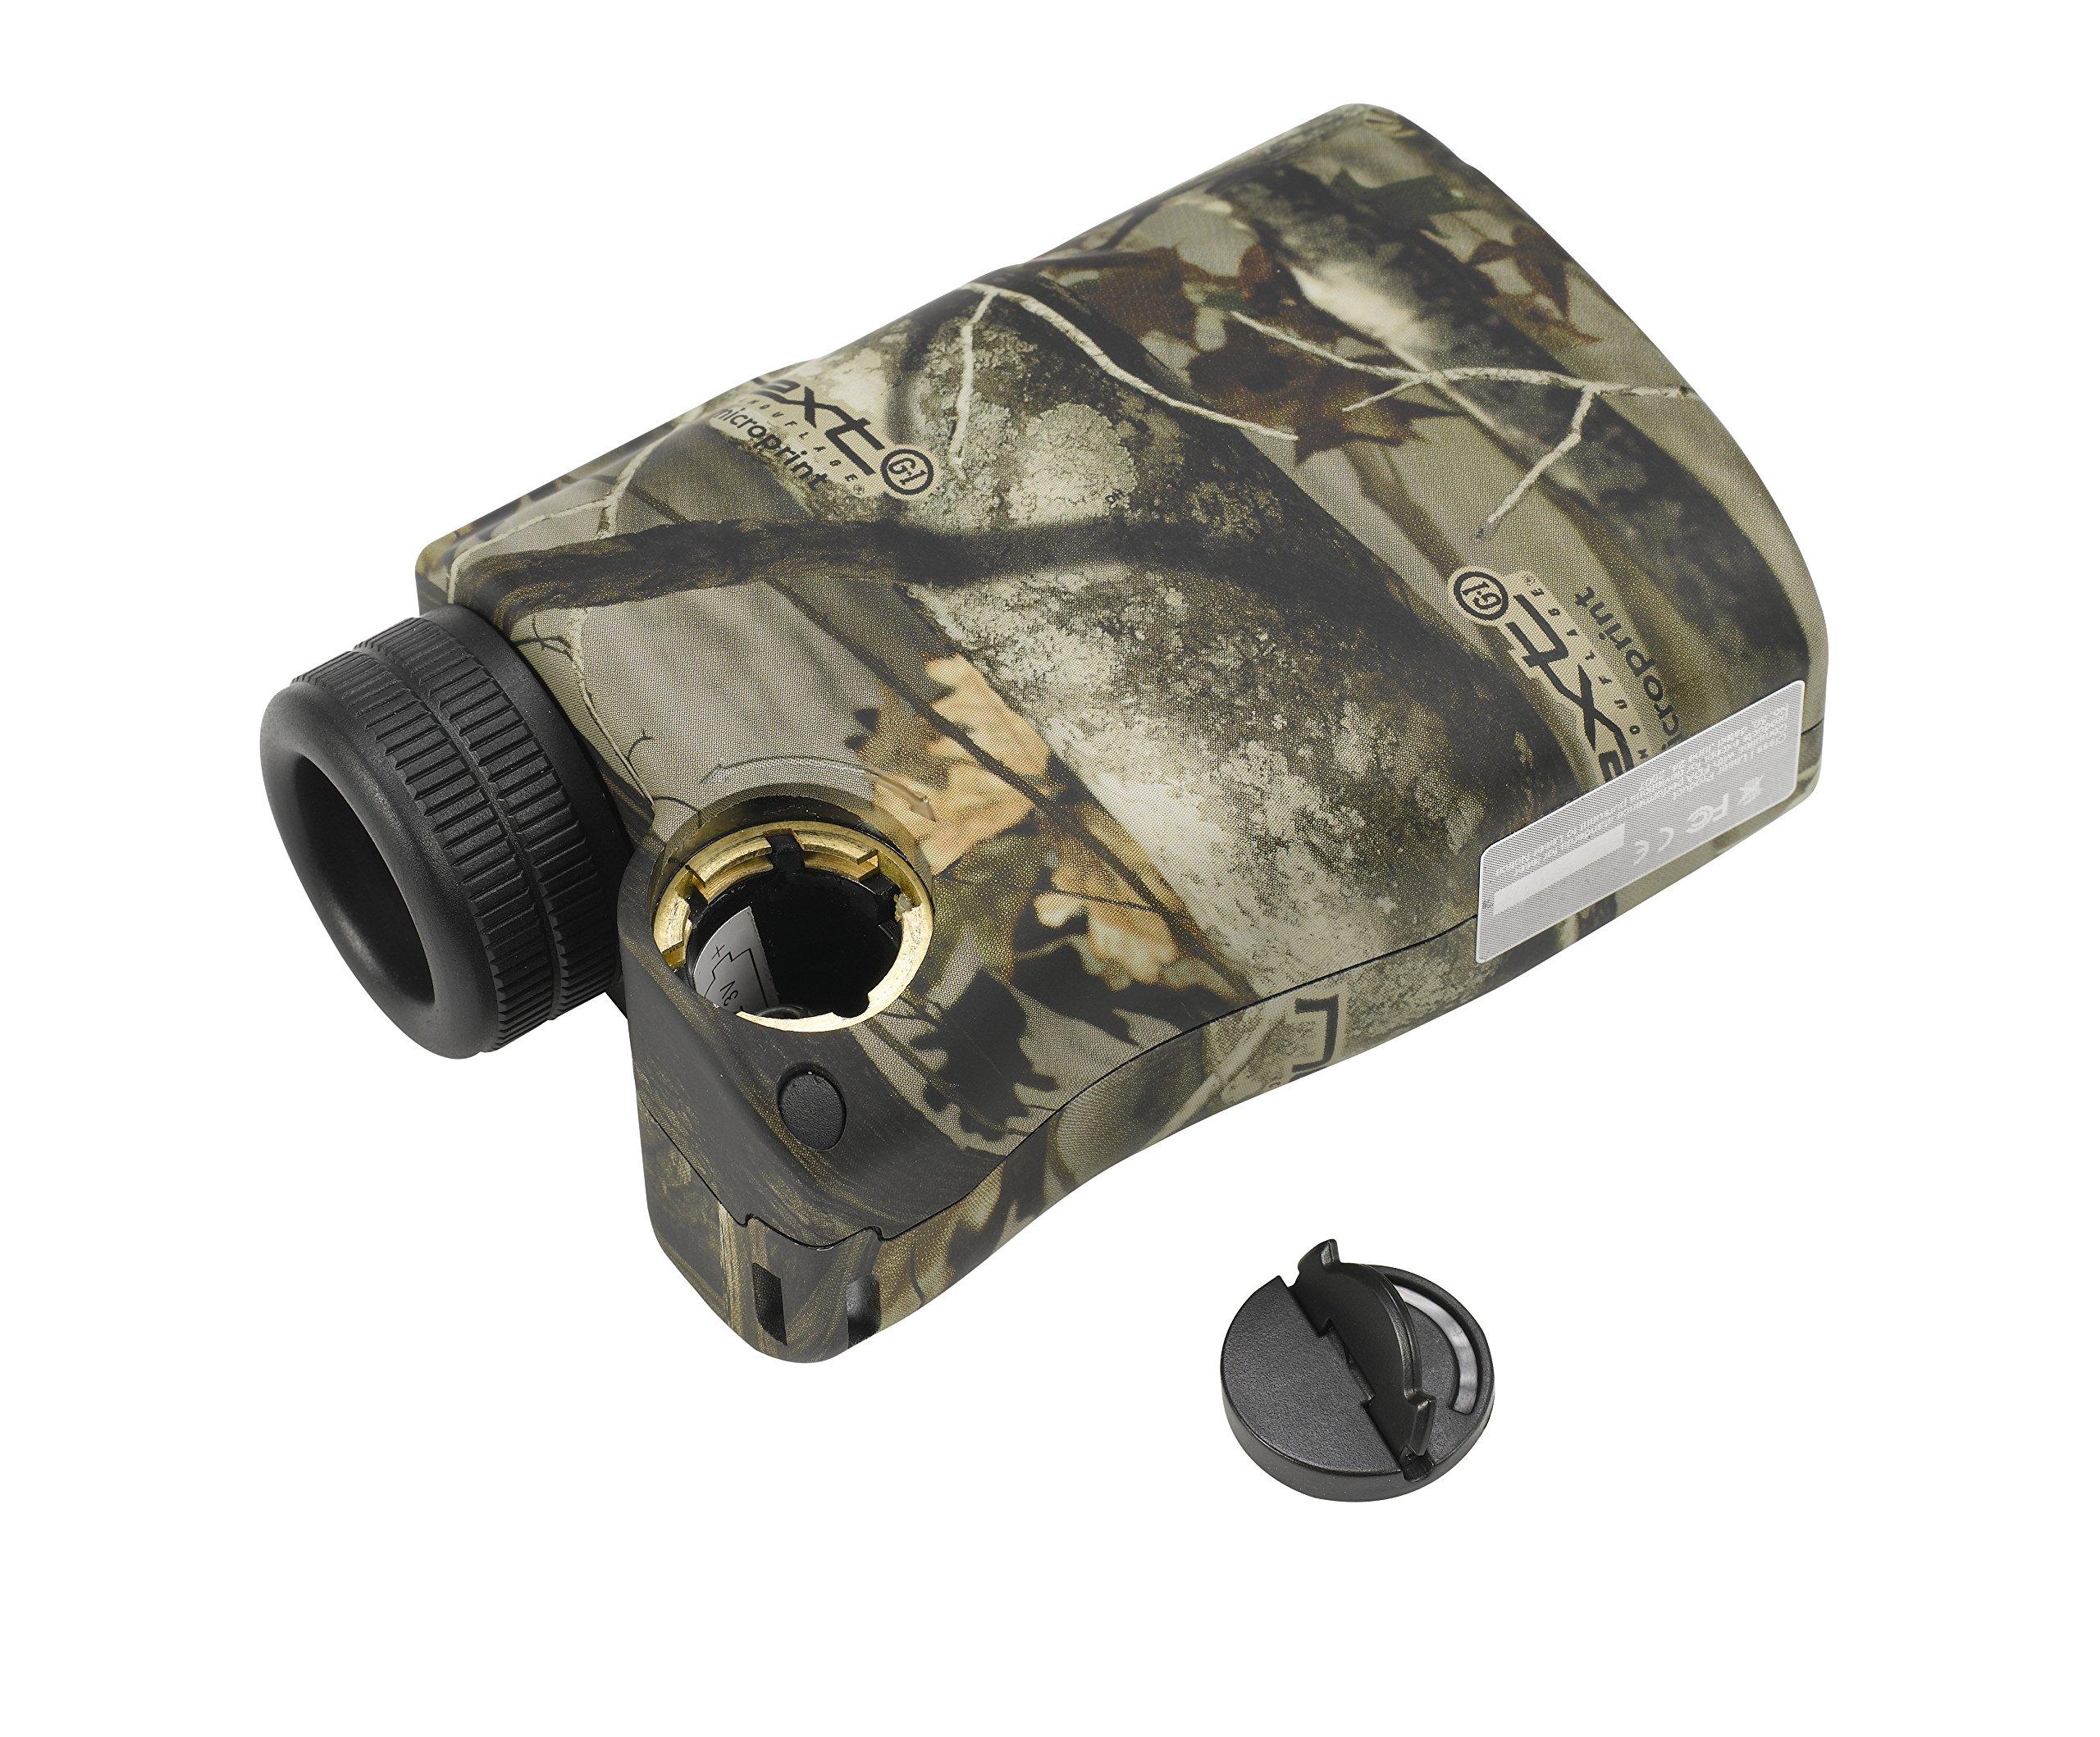 Finnhomy 6 x 25mm Laser Binocular Rangefinder Distance Range Finder Speed Distance Measurement Scope 600 Yards Outdoor Activity Hunting Golf Racing Climbing Navigation Forestry Waterproof Free Battery by Finnhomy (Image #4)